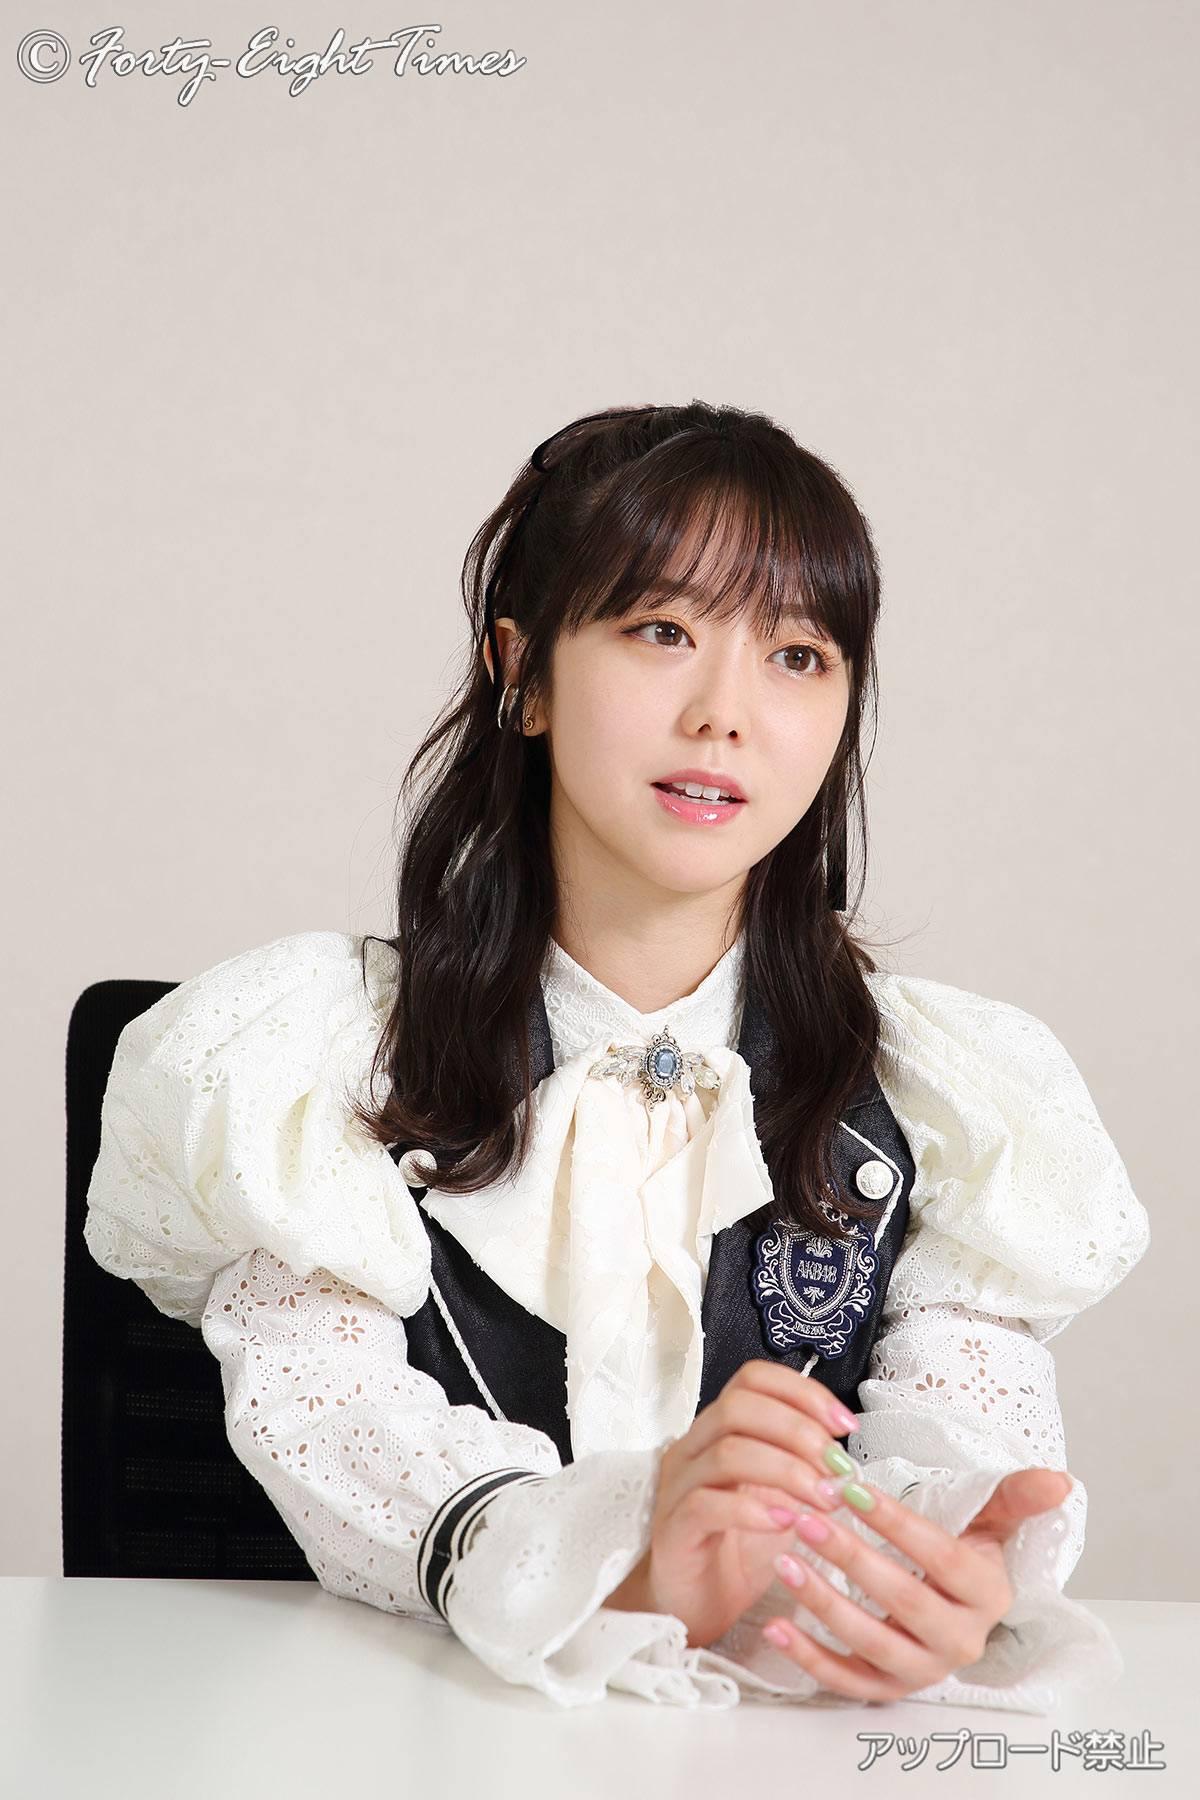 Minegishi Minami 48 Times 2105 09.jpg